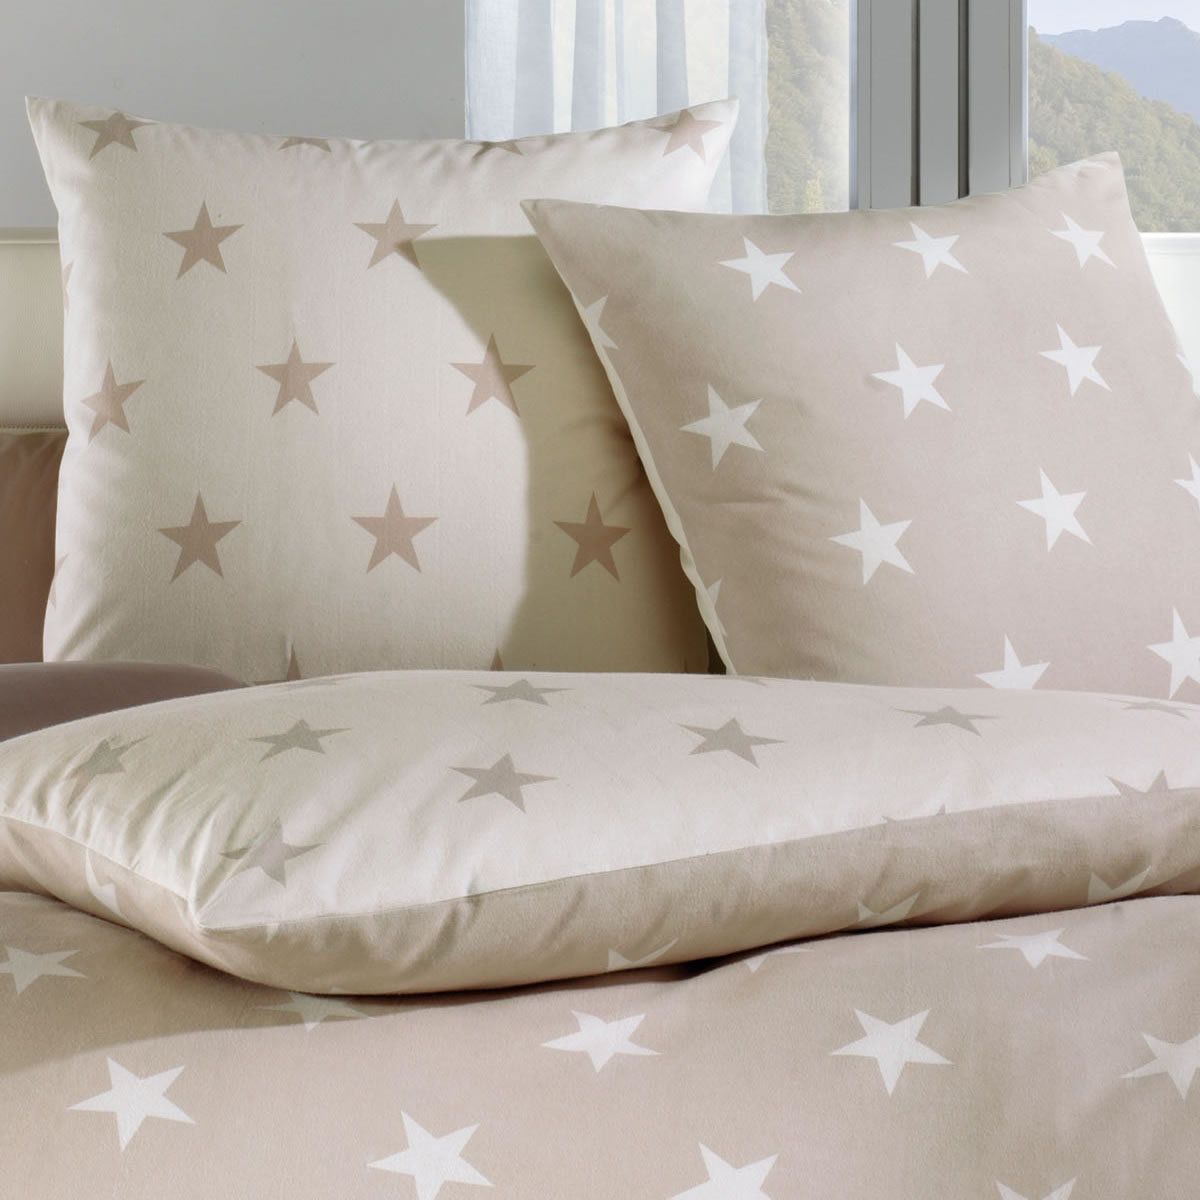 kaeppel biber wende bettw sche design stars natur 32746 sterne. Black Bedroom Furniture Sets. Home Design Ideas